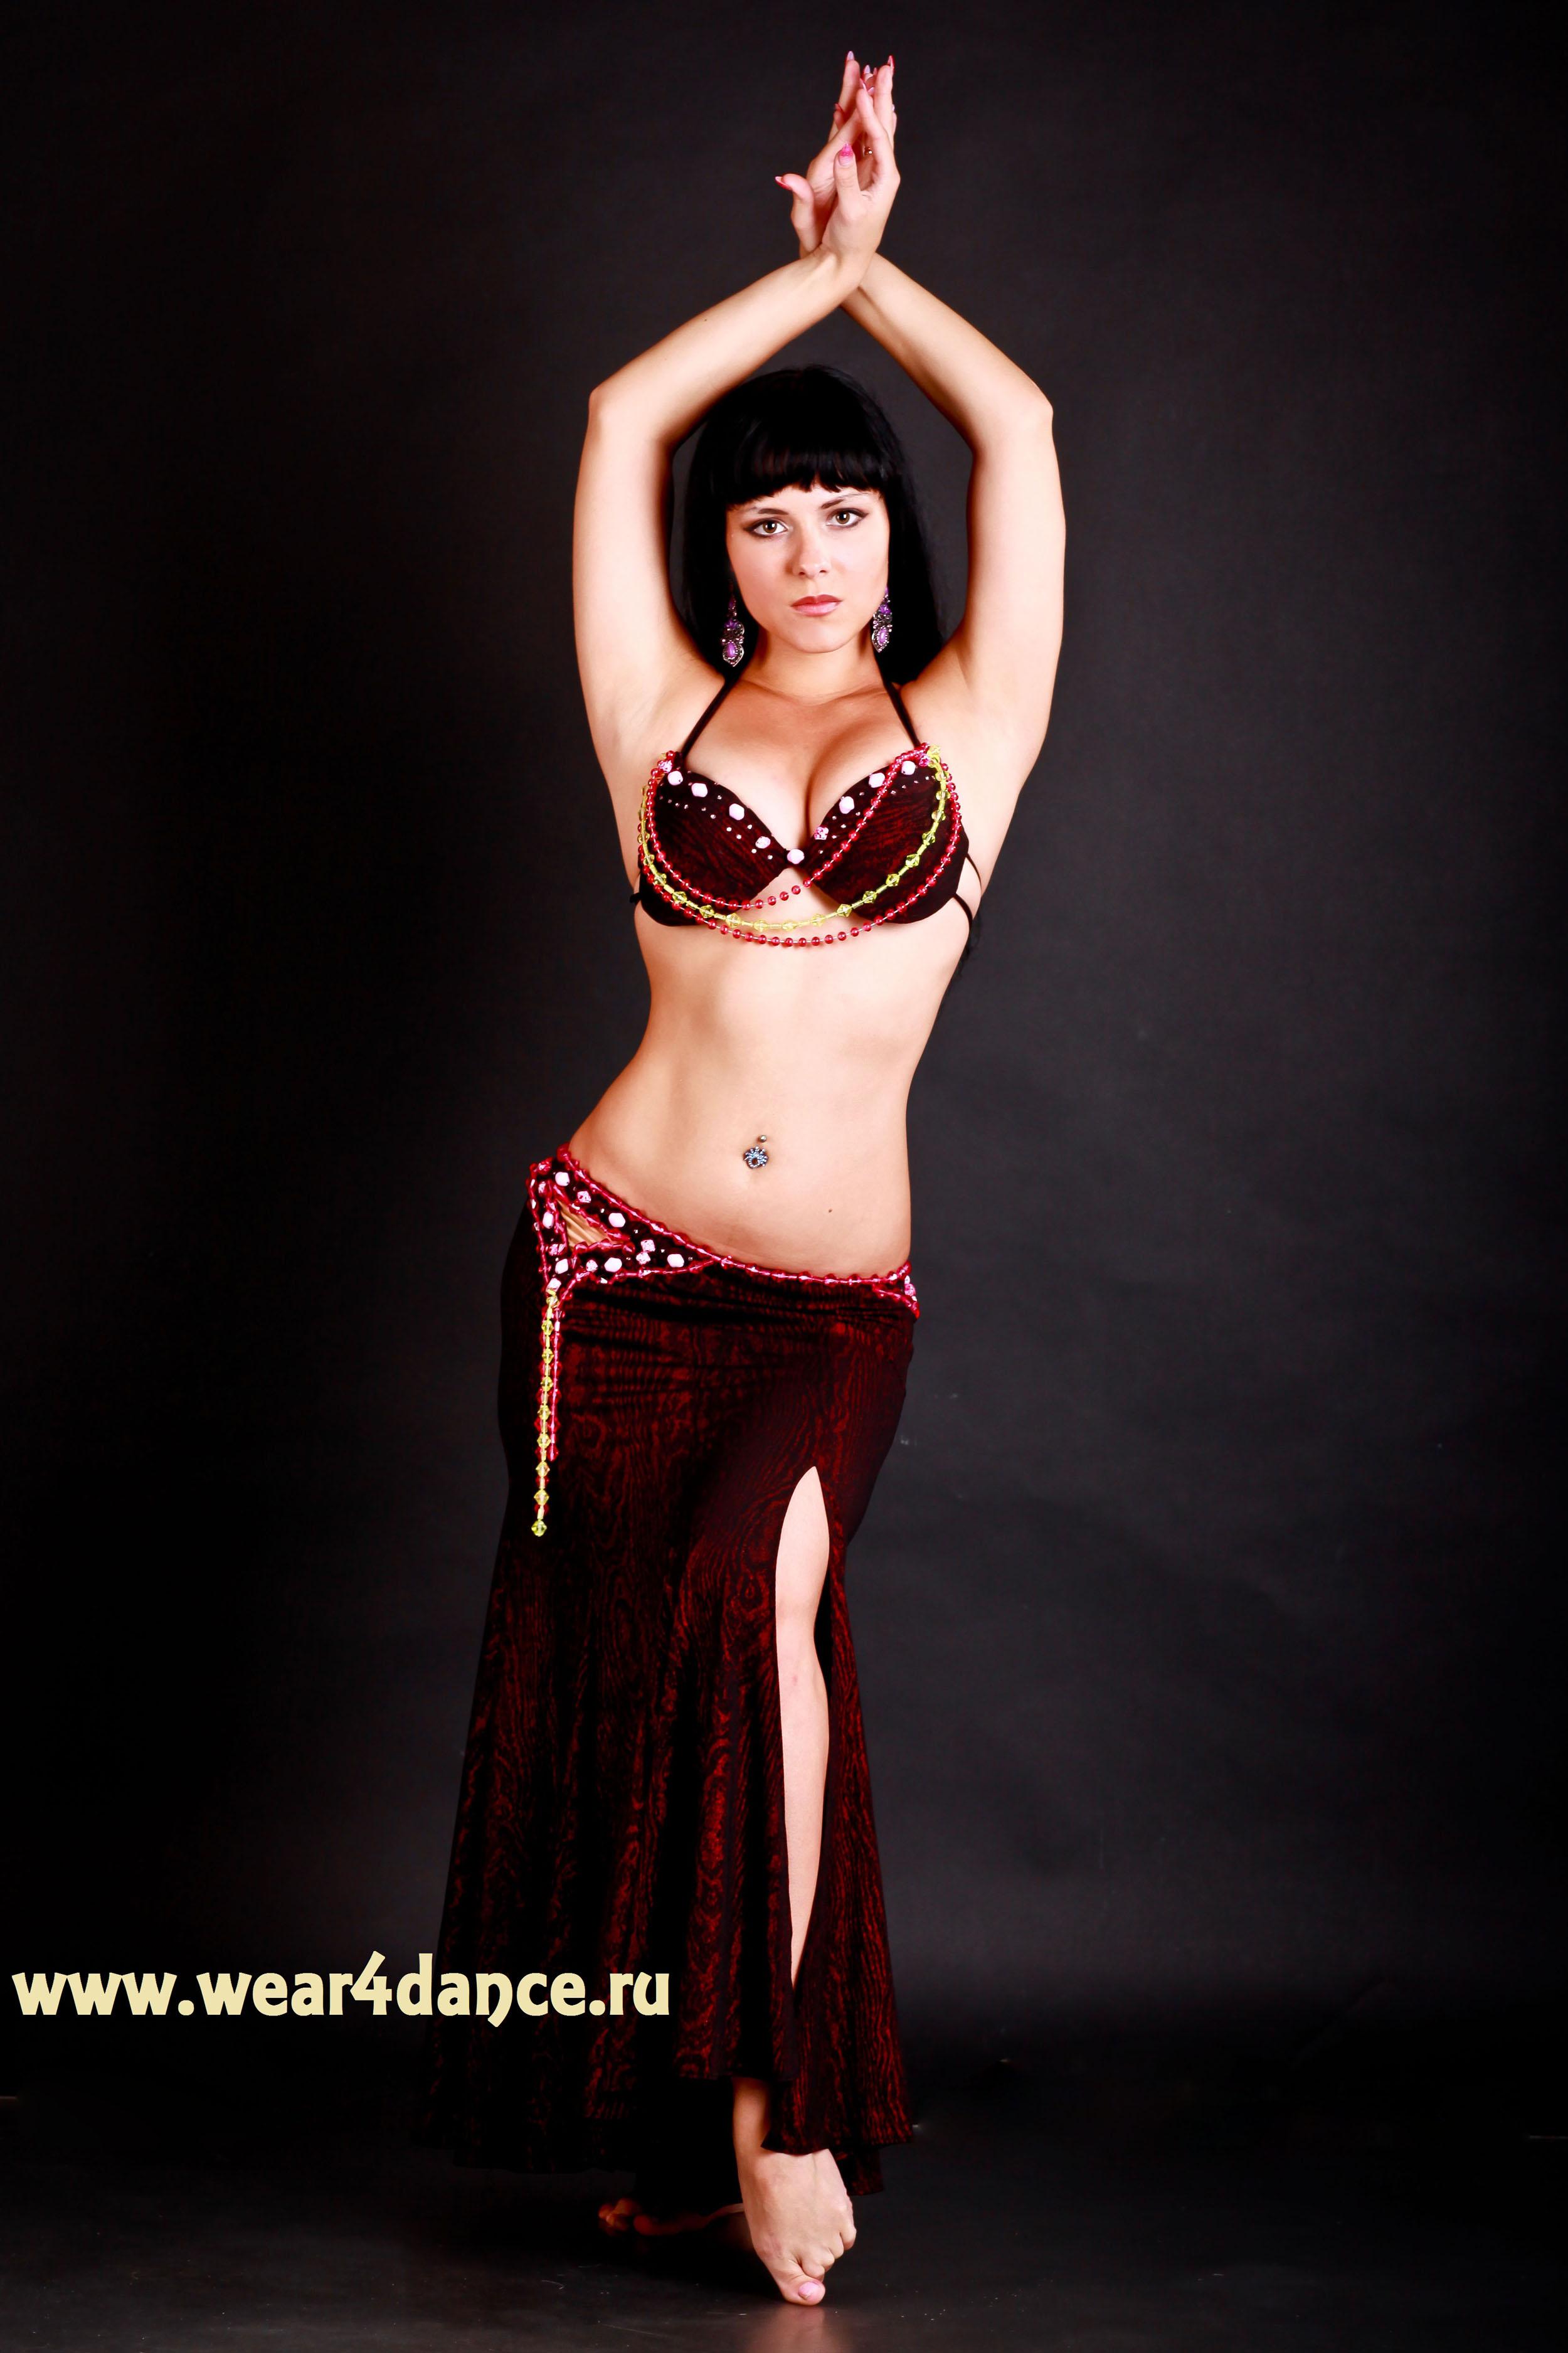 Юбке танцует стриптиз 7 фотография